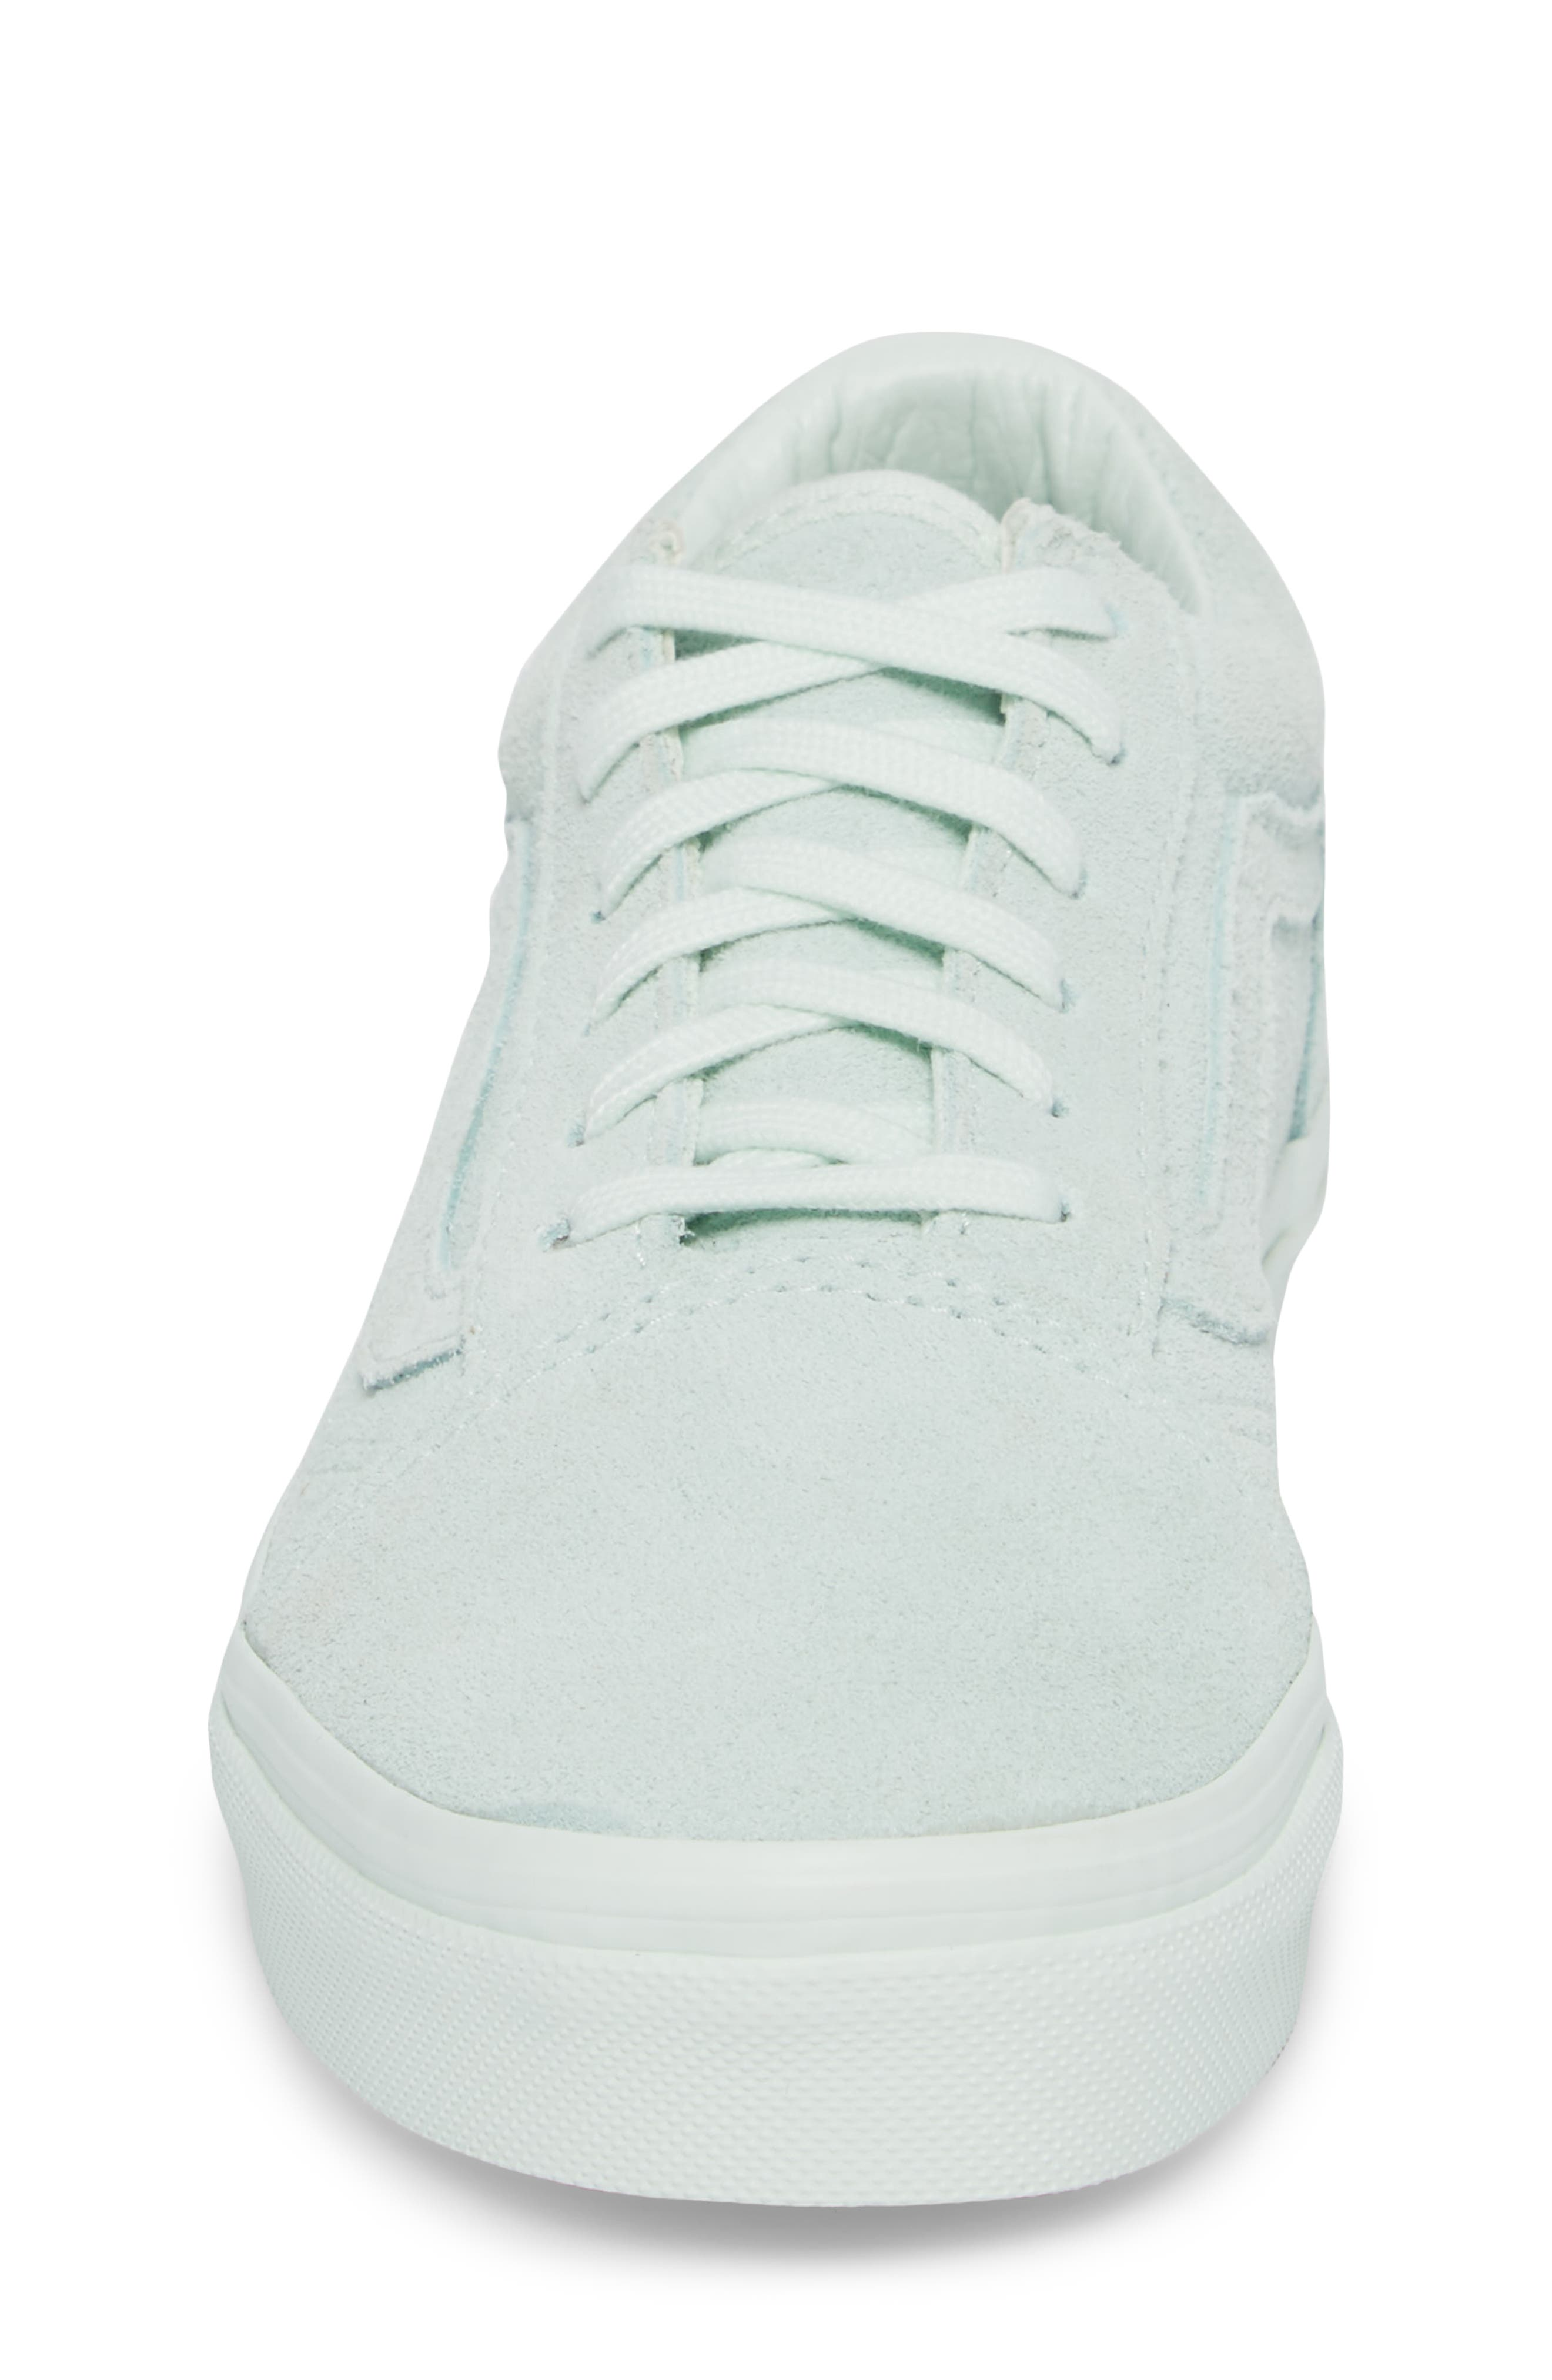 Old Skool Low Top Sneaker,                             Alternate thumbnail 4, color,                             300